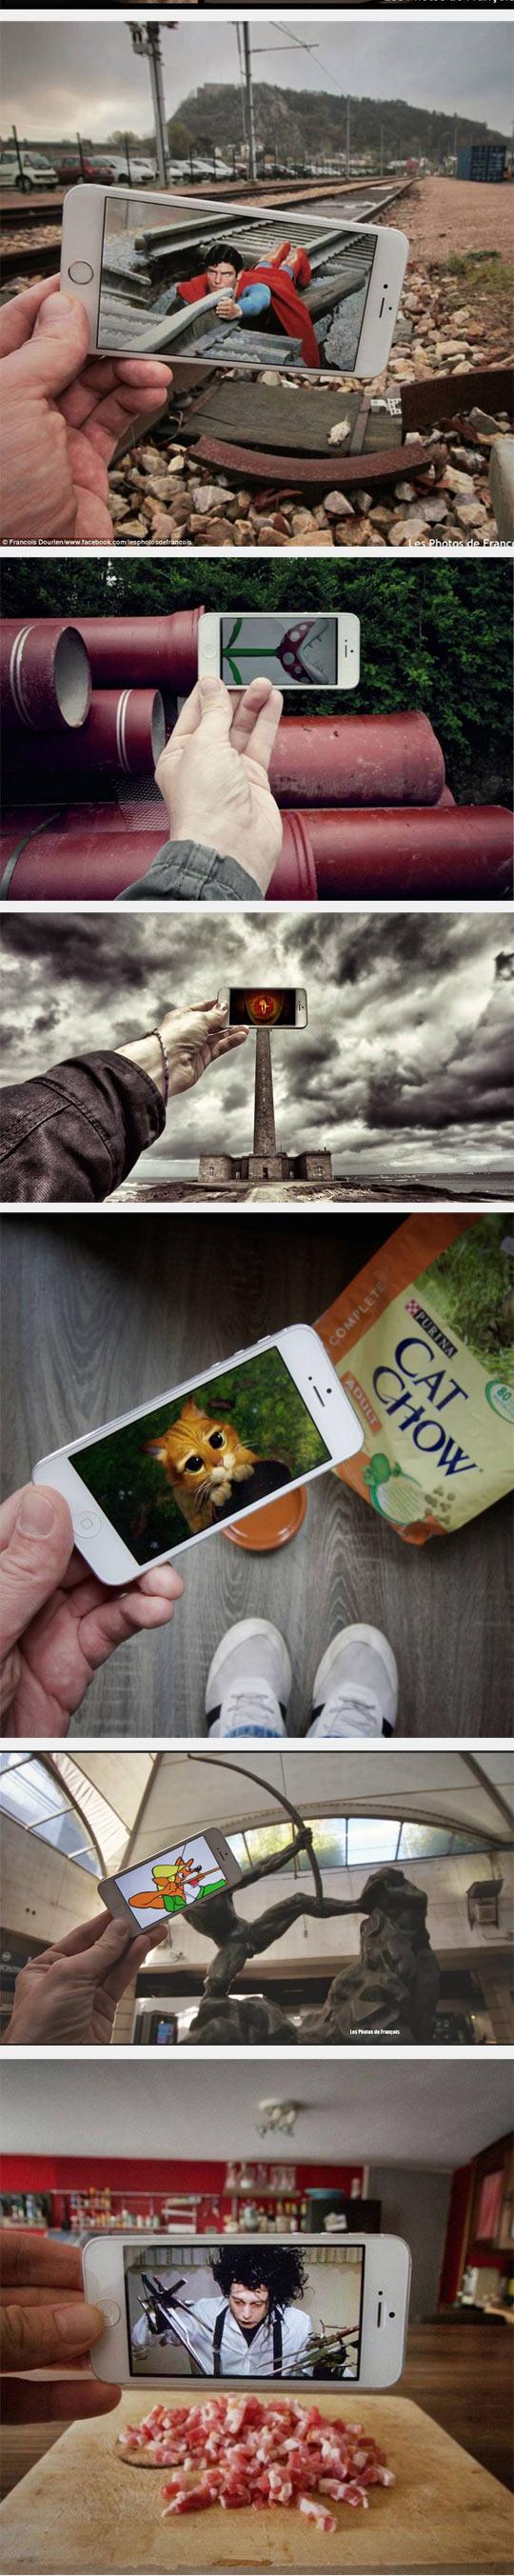 funny-phone-image-Thor-Lion-King-reality-Superman